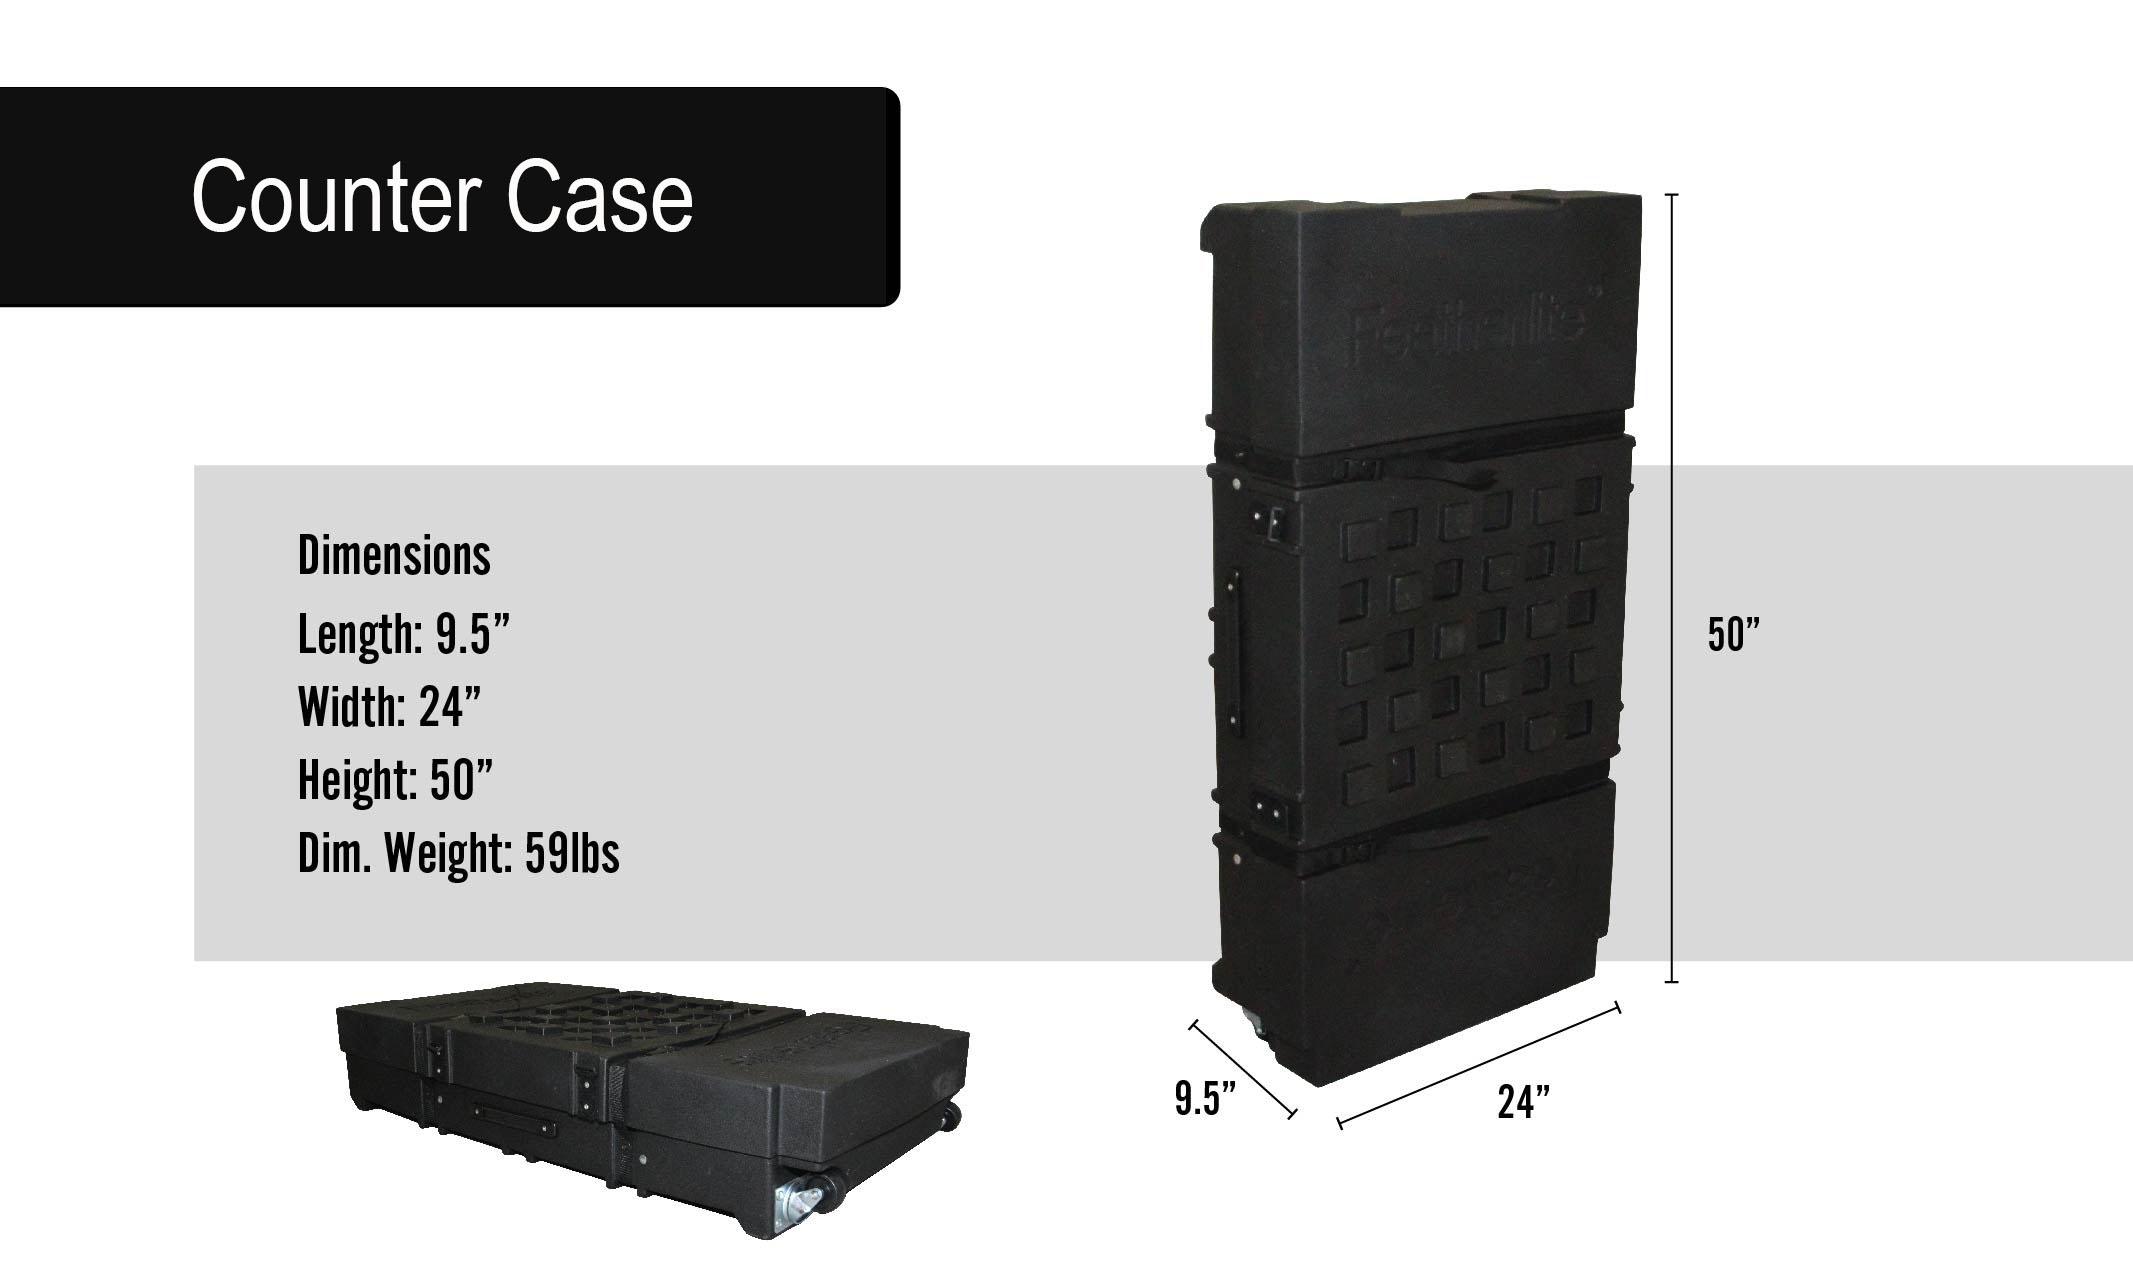 Valencia Portable Displays Counter Case